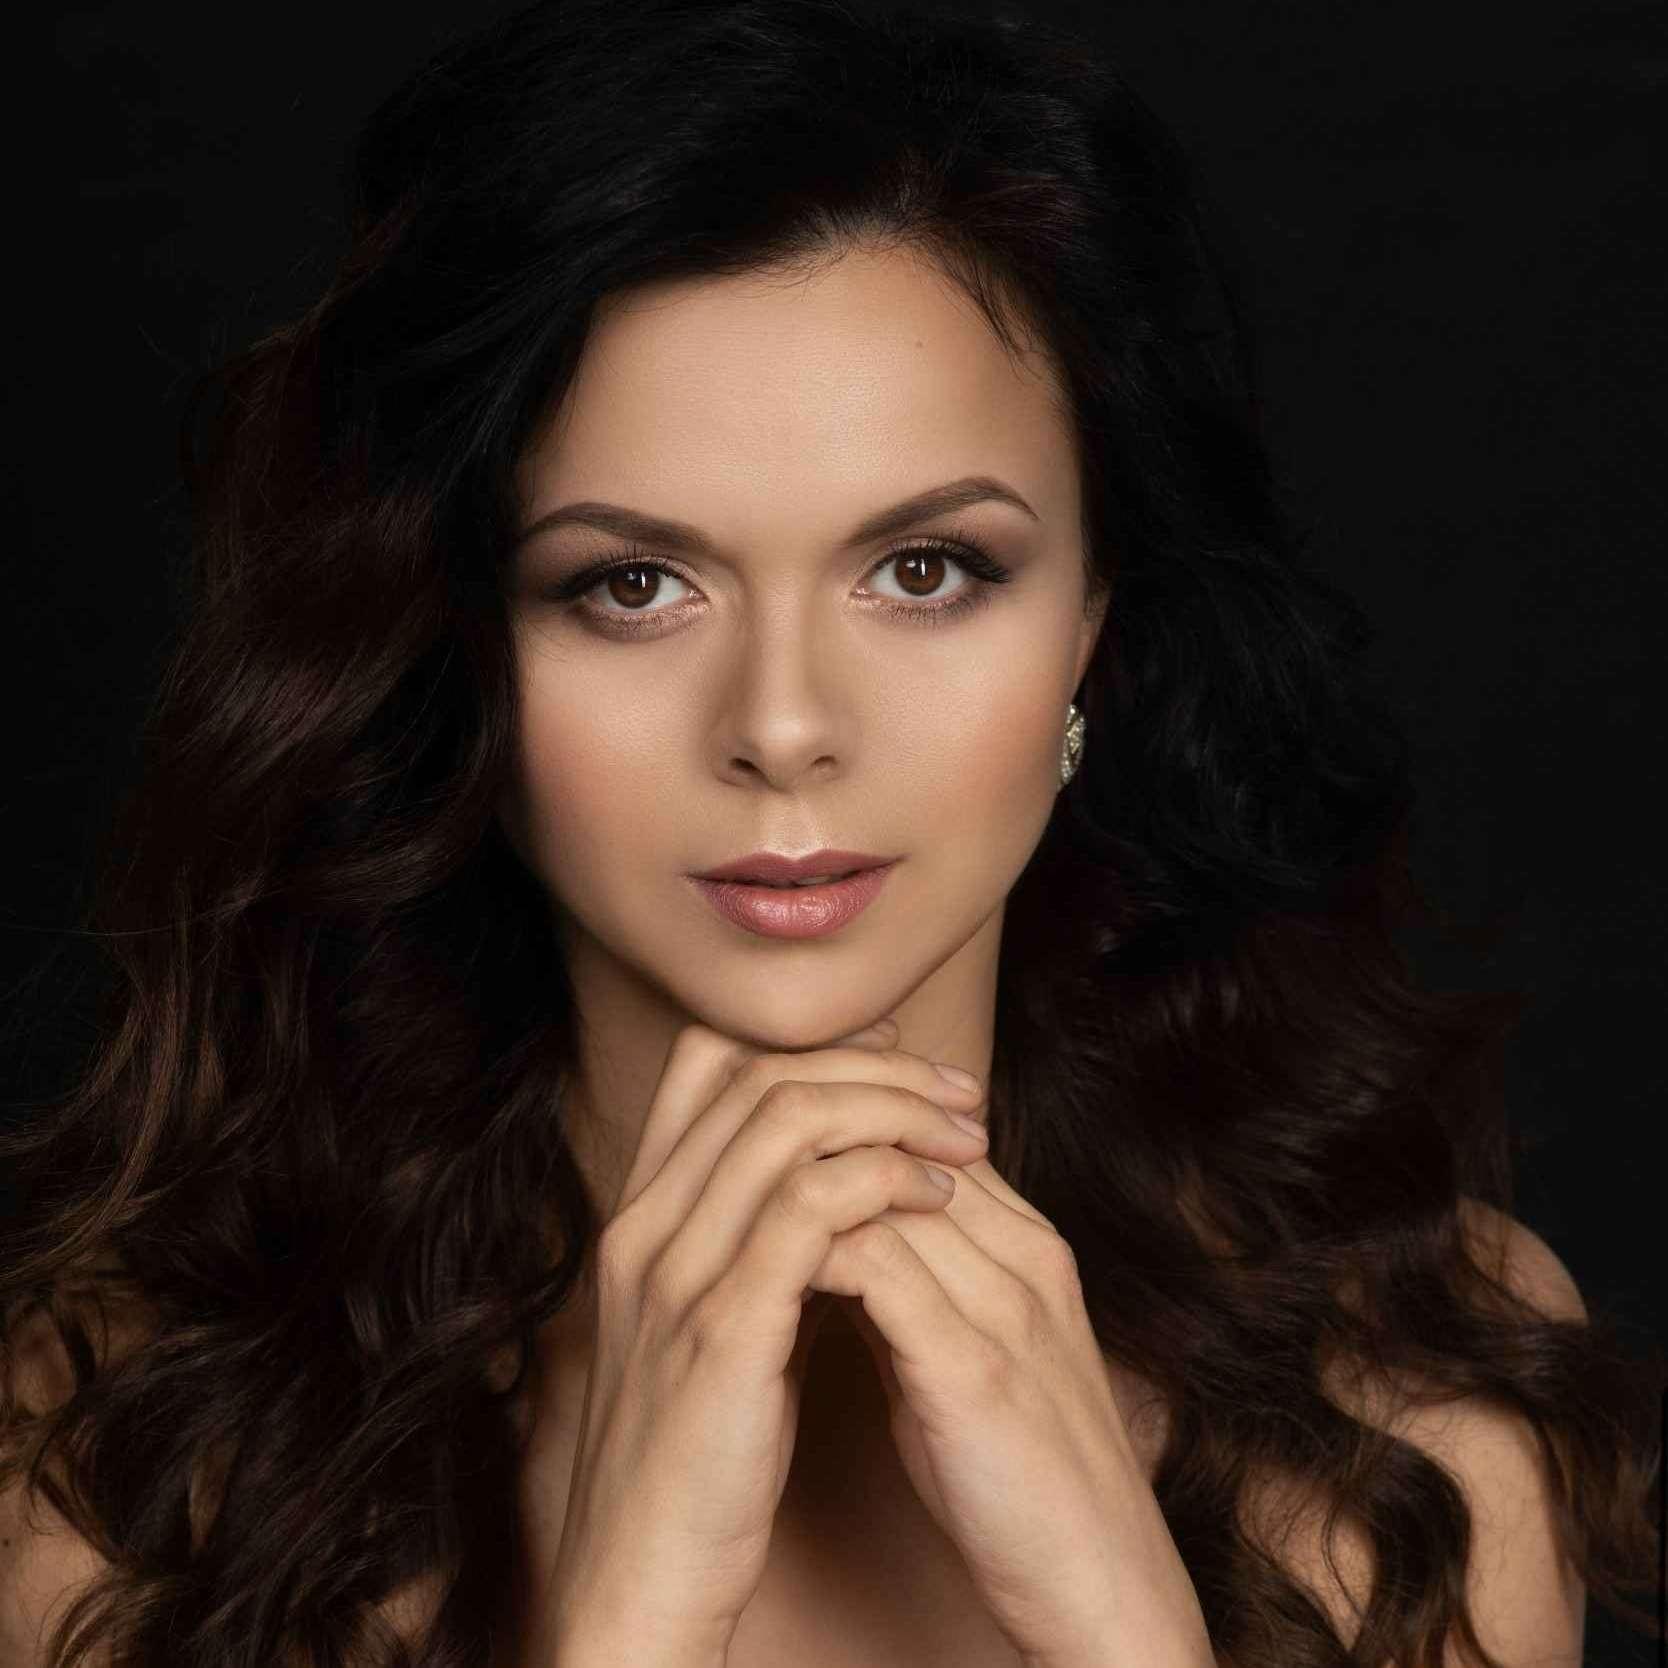 Nadezhda  Karyazina - Profile picture